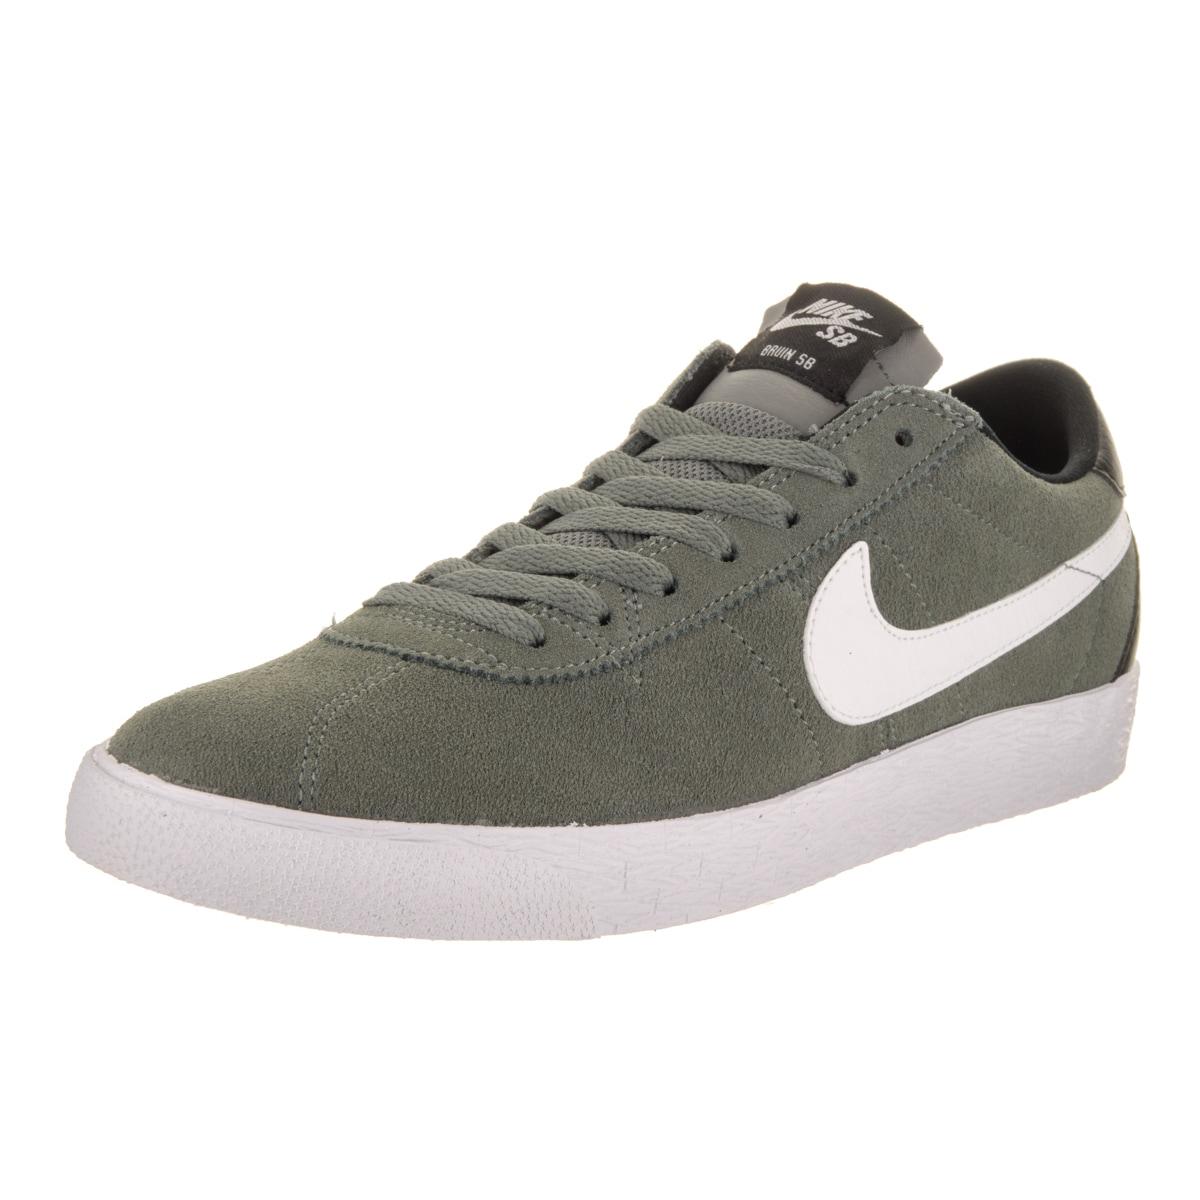 Nike Men's SB Bruin Zoom Premium SE Grey Suede Skate Shoe...